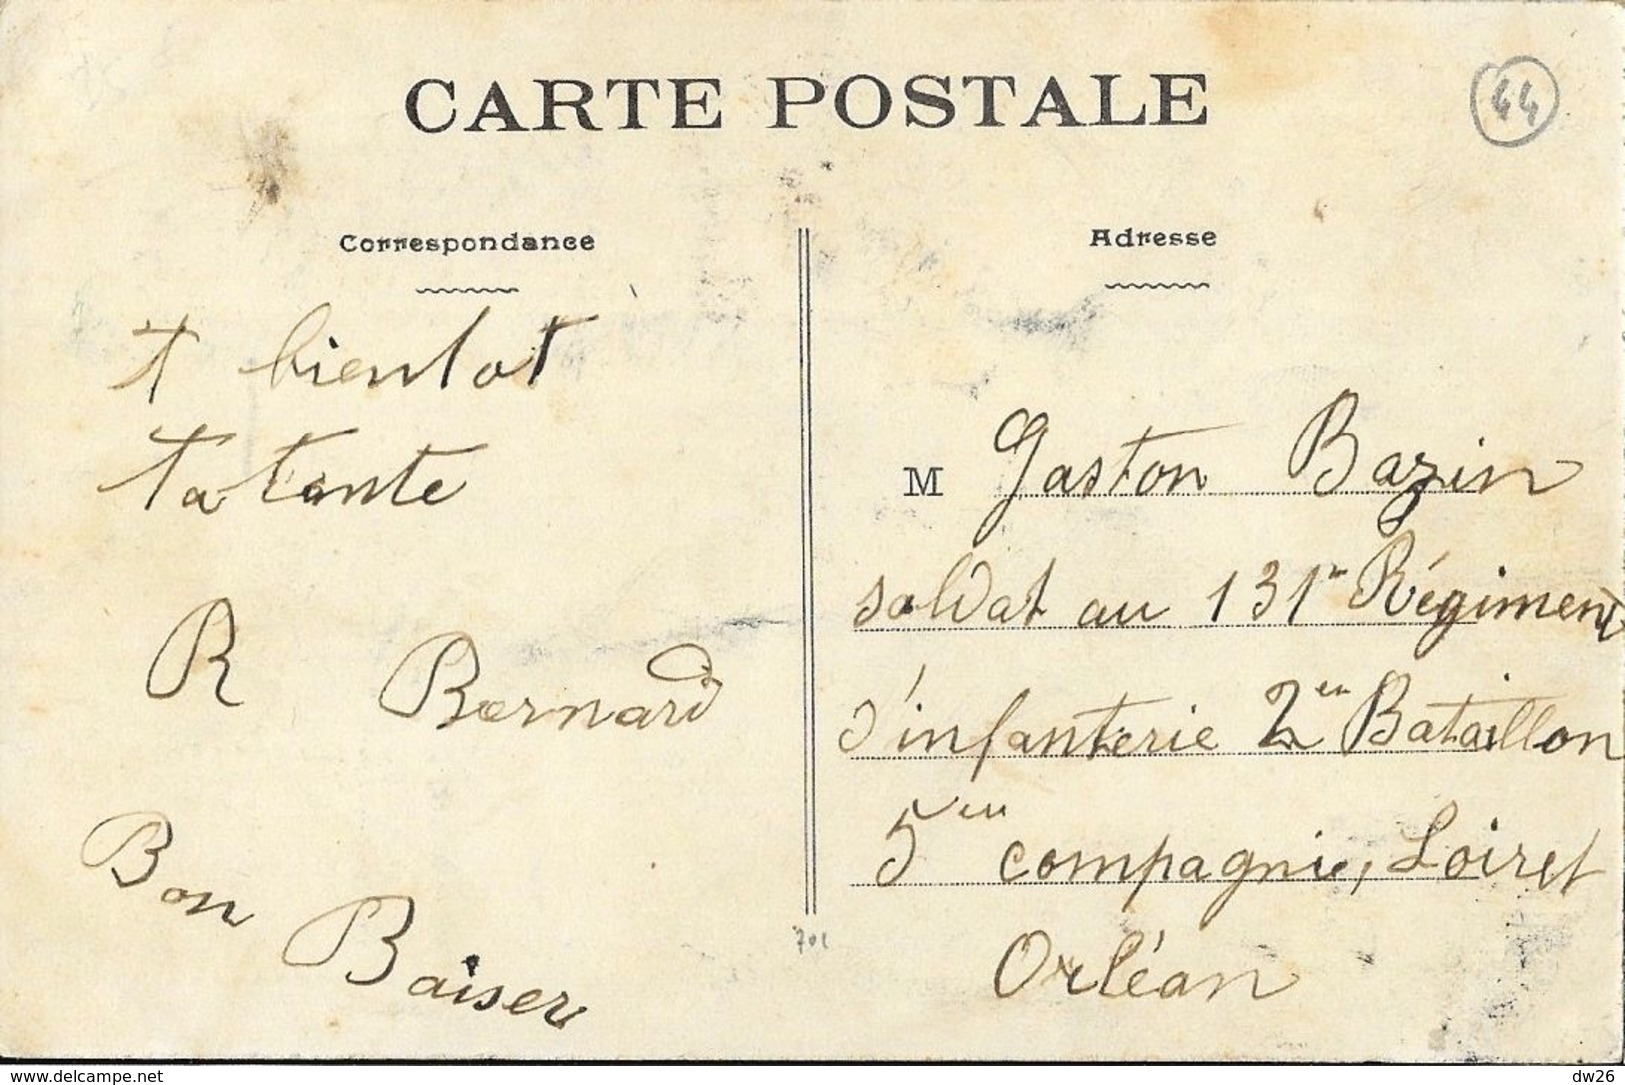 Souvenir Du Village Breton (Nantes 1910) - Vieille Bretonne Fumant Sa Pipe - Phototypie Vassellier - Europe